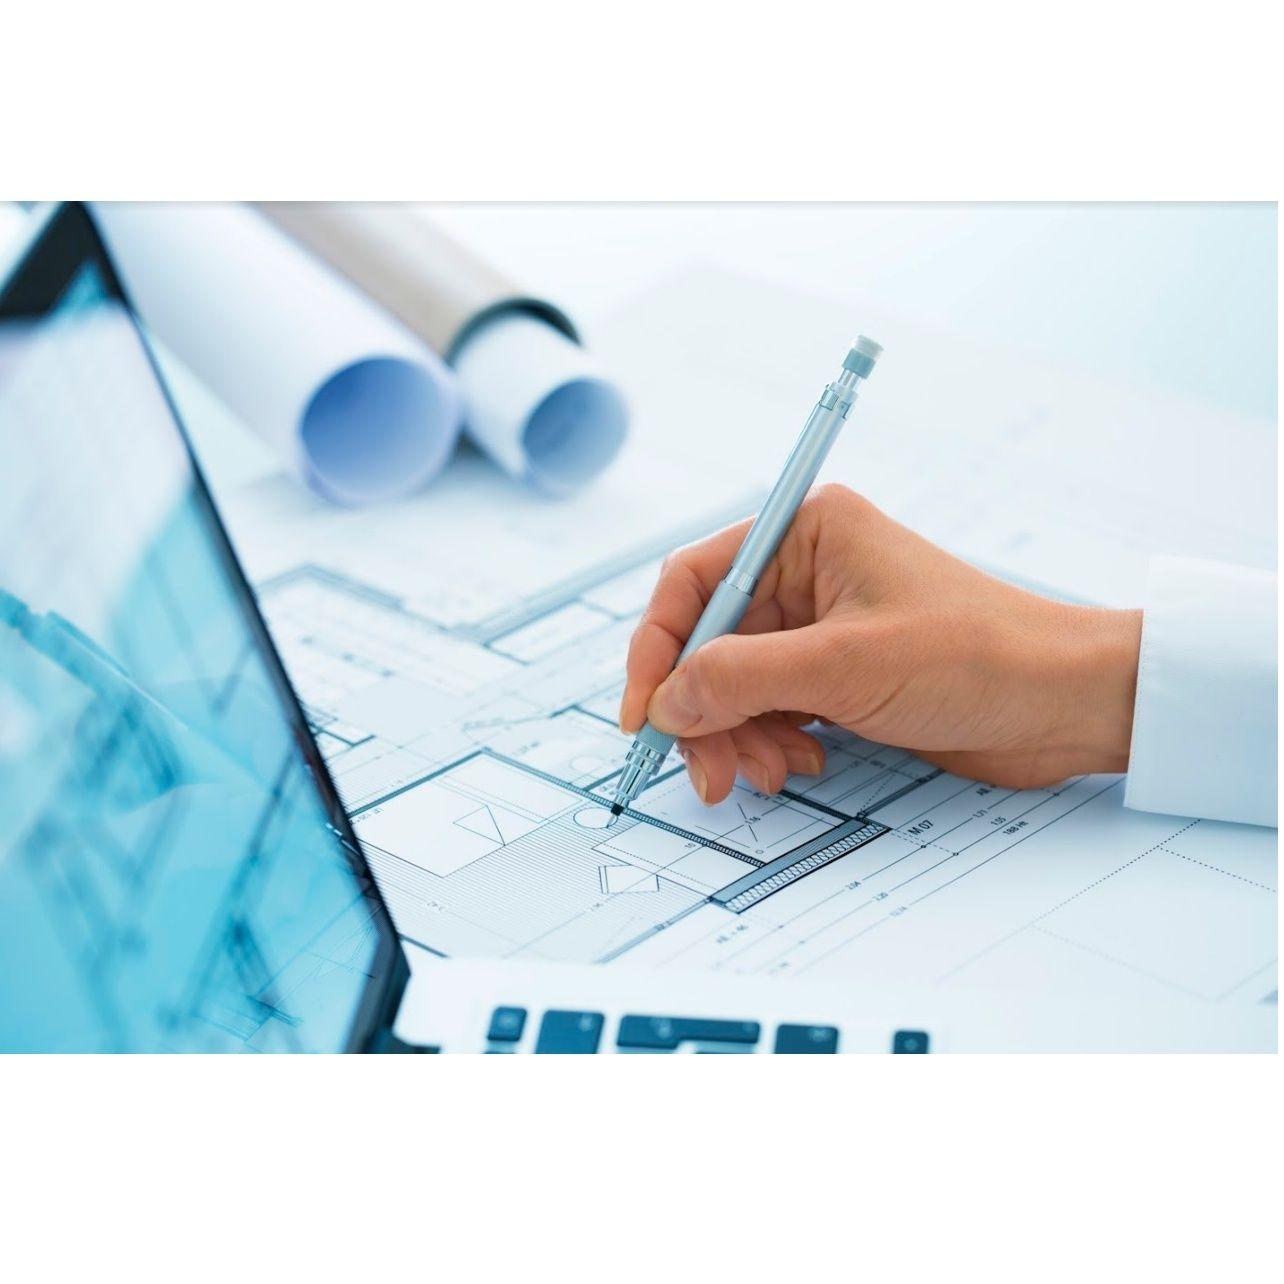 PROYECTOS DE URBANISMO: Catálogo de Blanco Arquitectos